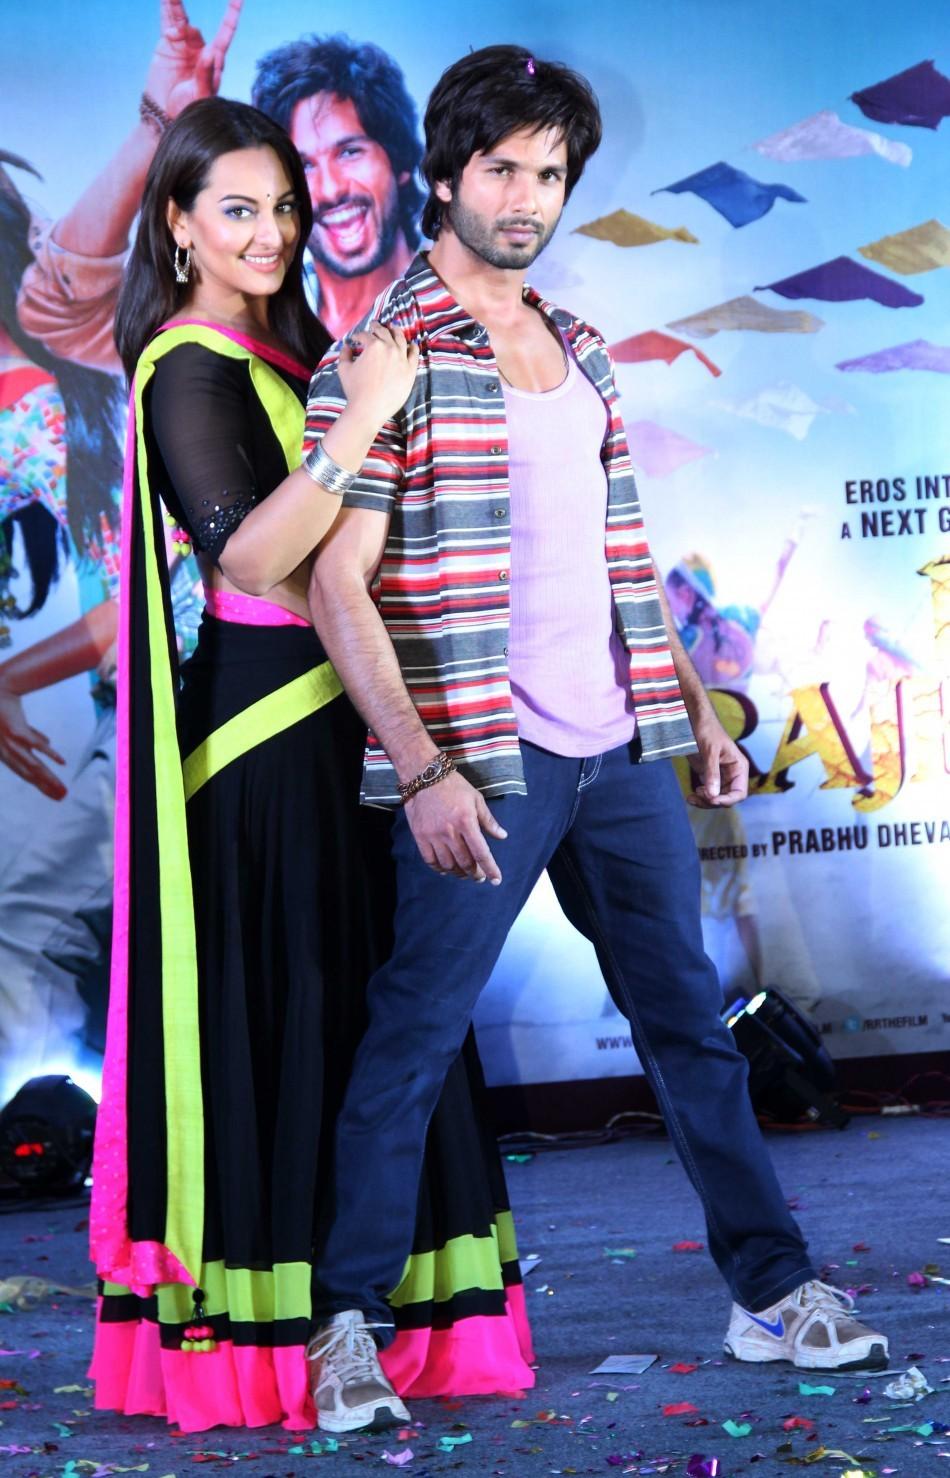 Shahid Kapoor, Sonakshi Sinha